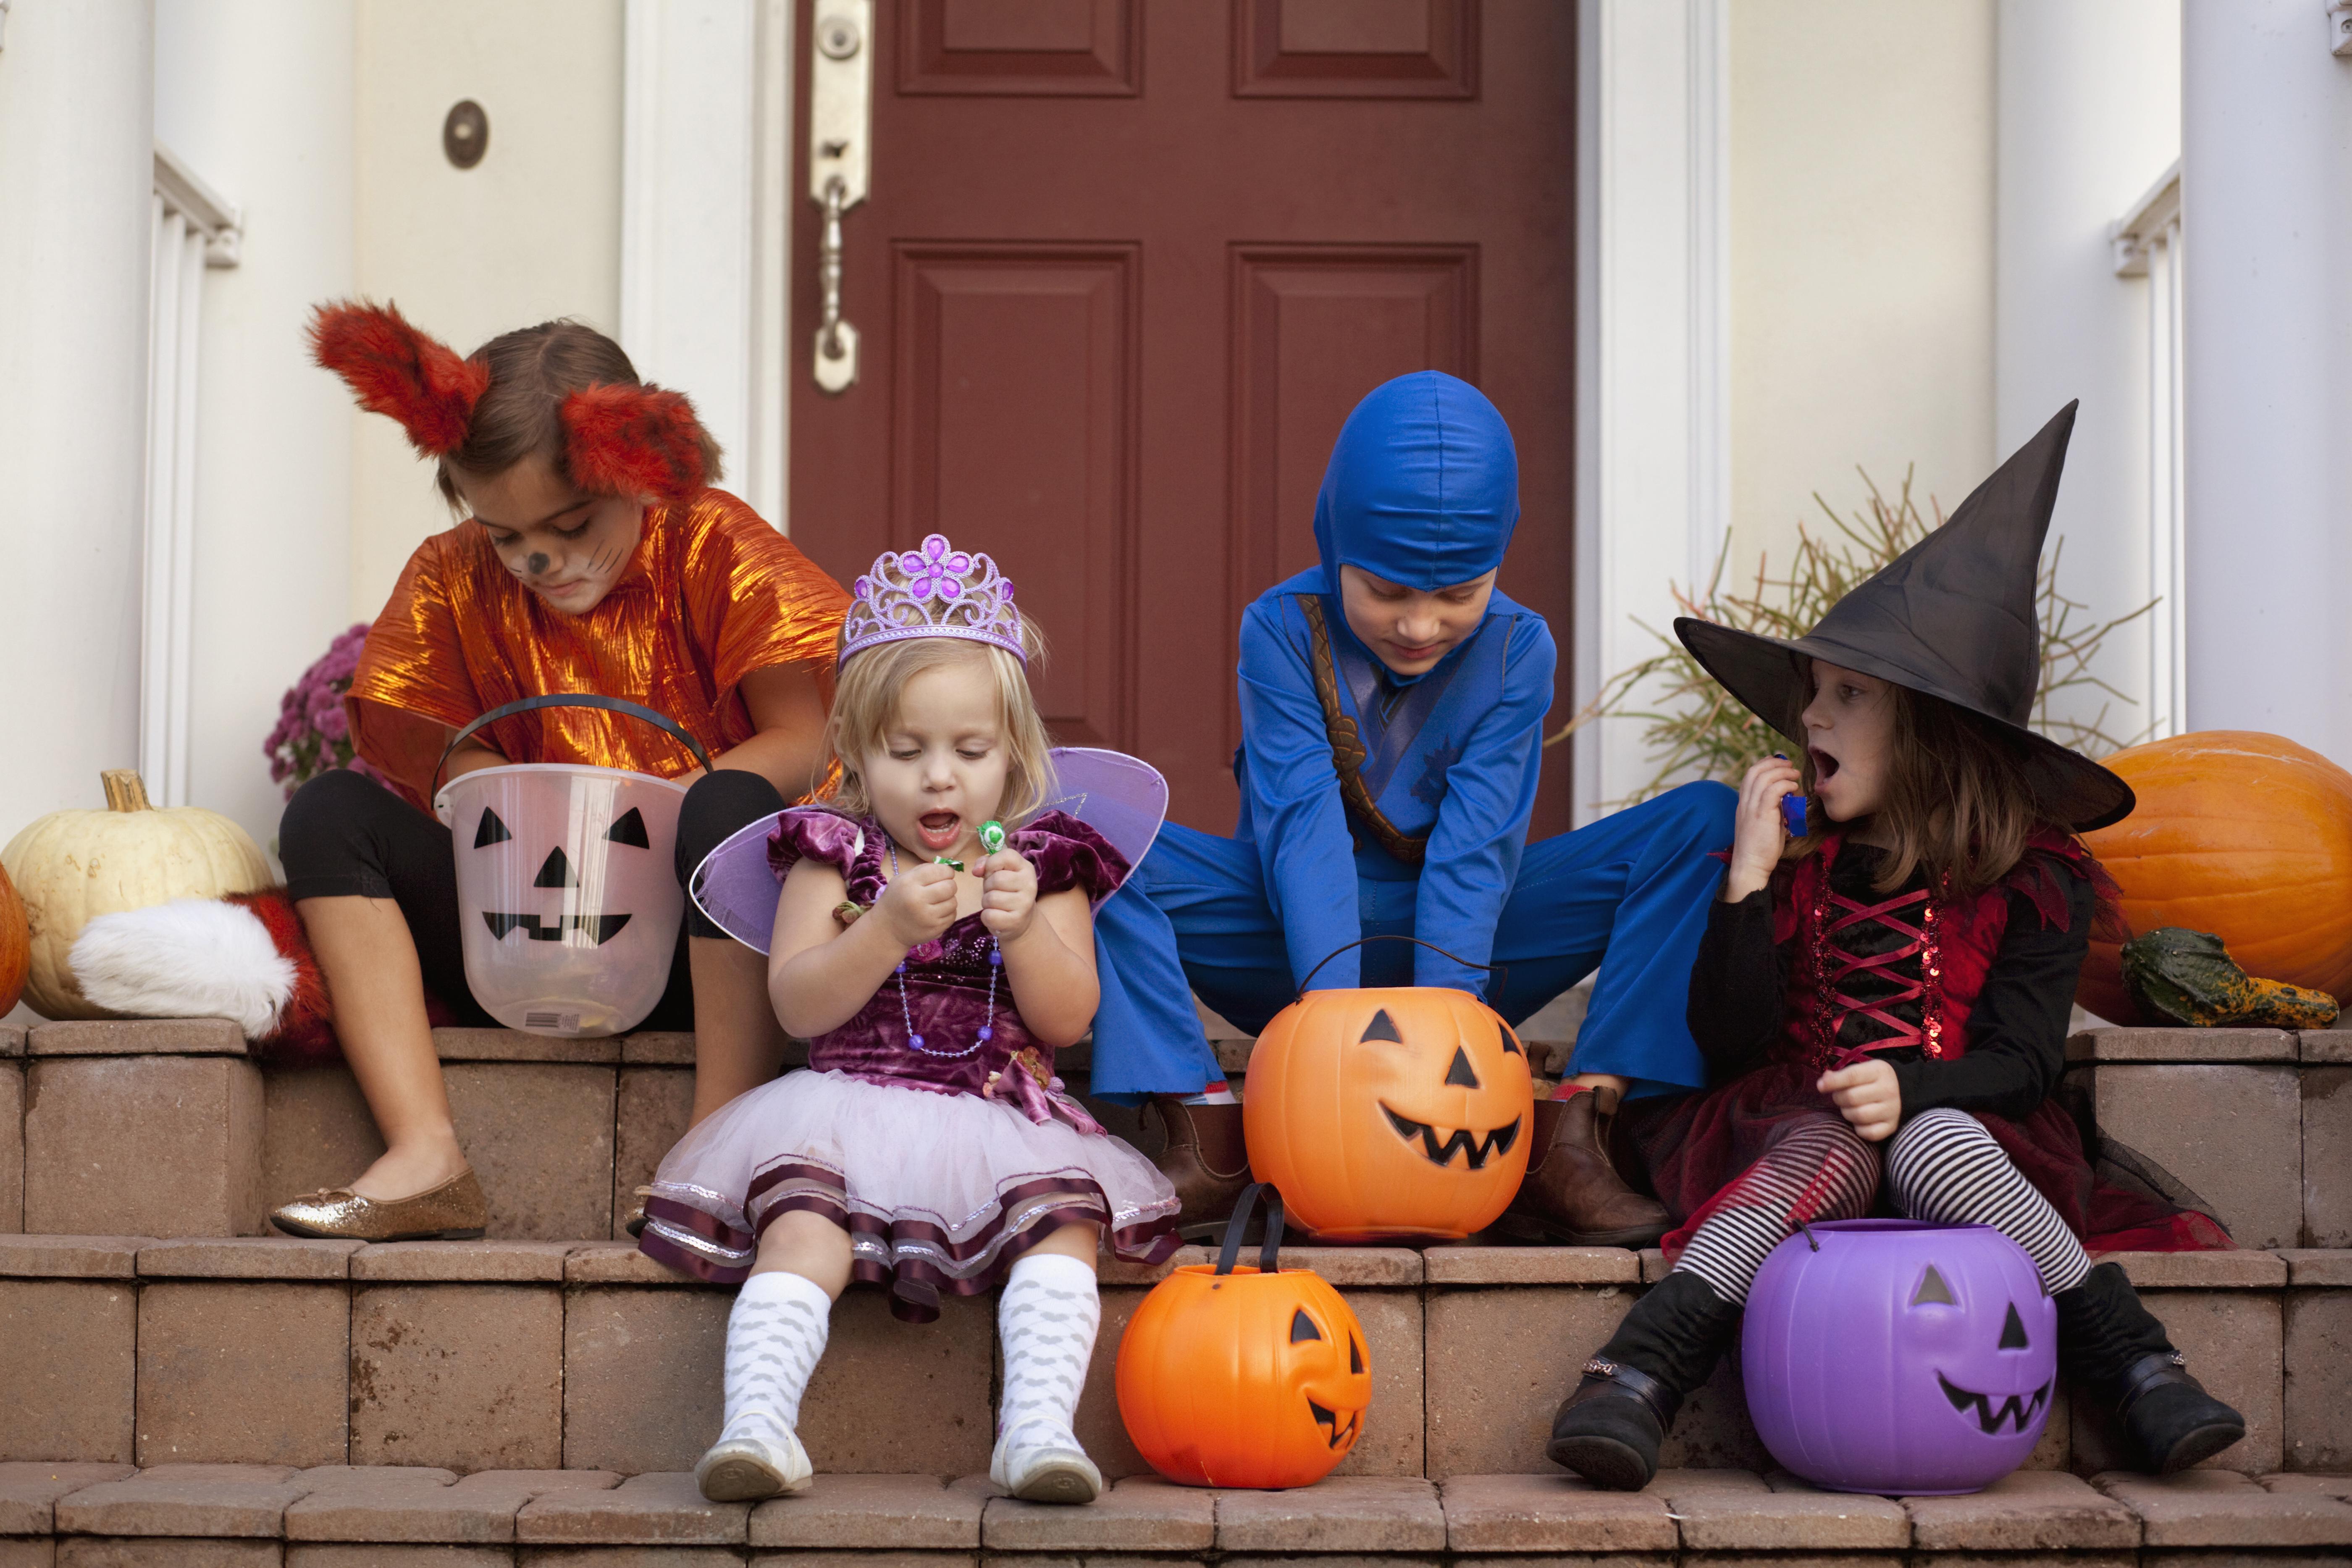 Children enjoying treats on steps